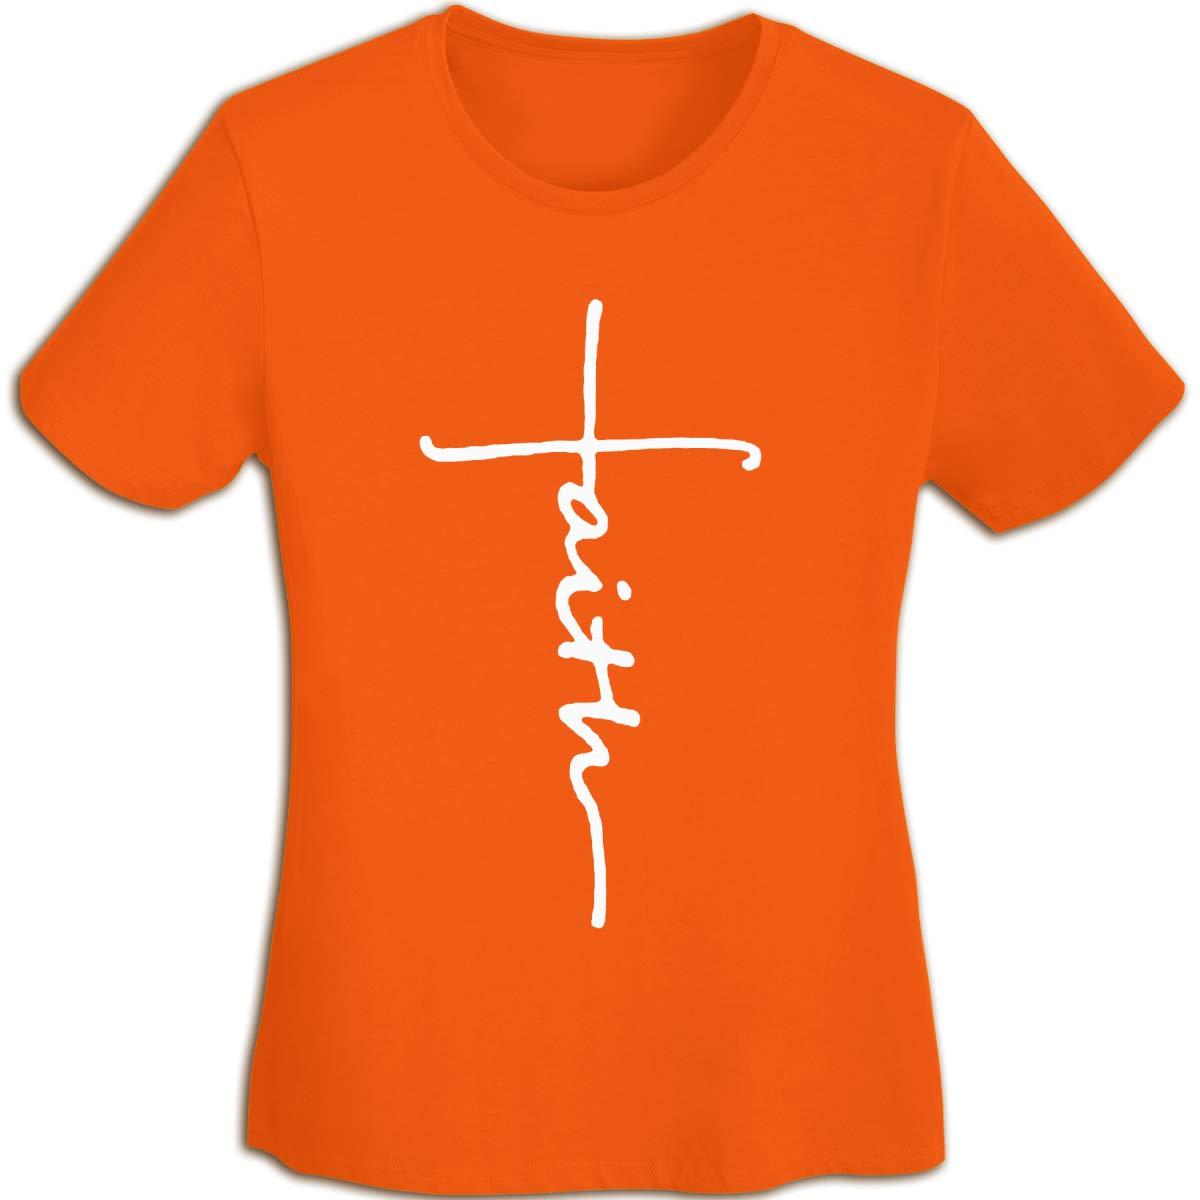 Women's T Shirt Cross Faith Shirts Jesus Tshirts Cotton Christian T-Shirt Short-Sleeve Tshirt for Women Youth Girls Orange L by BKashy